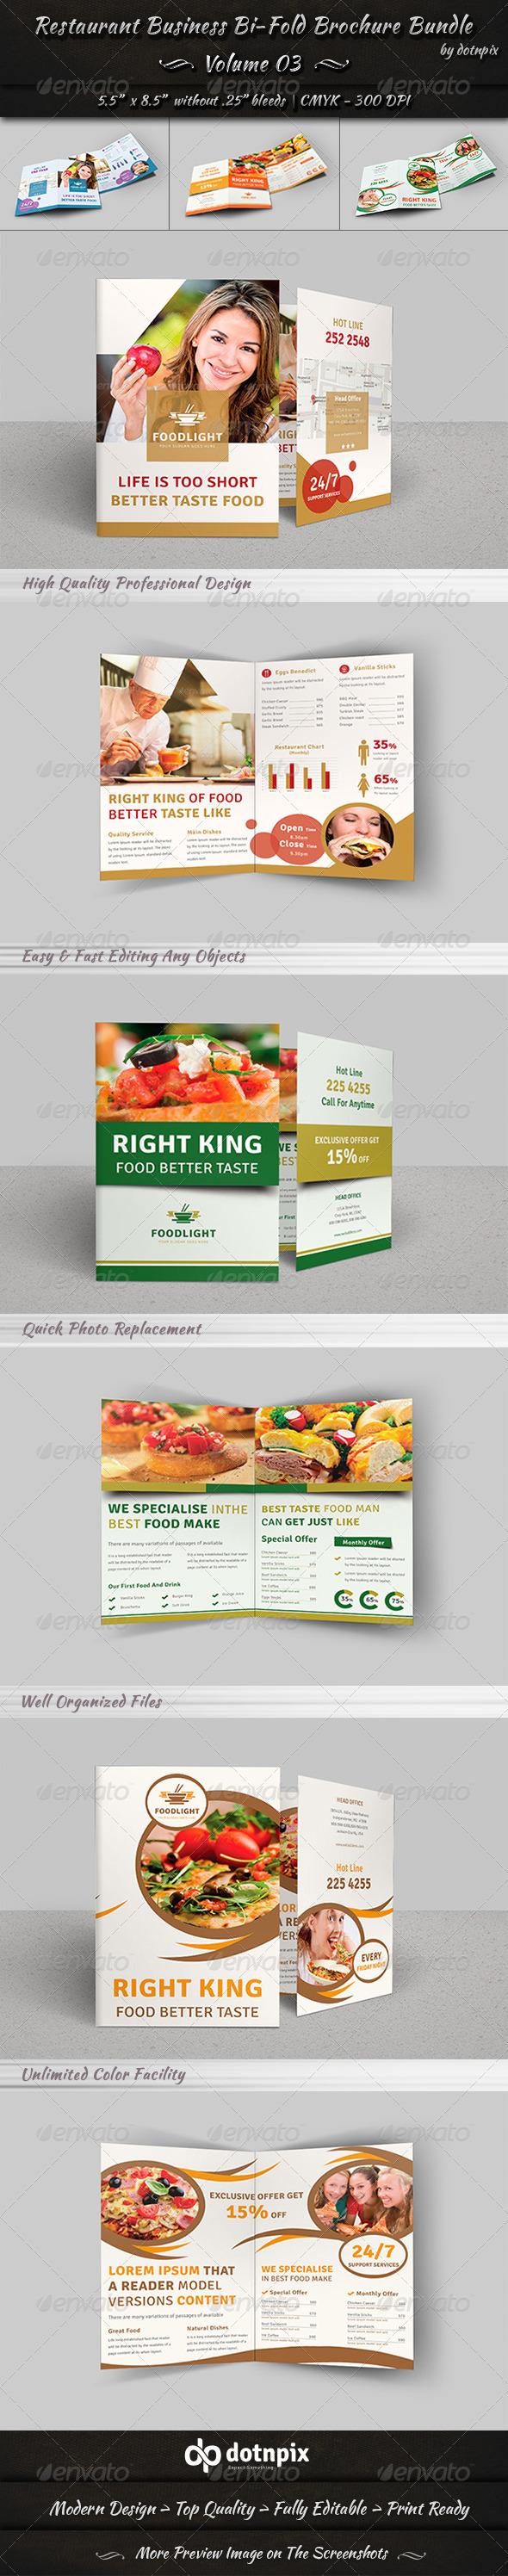 GraphicRiver Restaurant Bi-Fold Brochure Bundle Volume 3 8124098